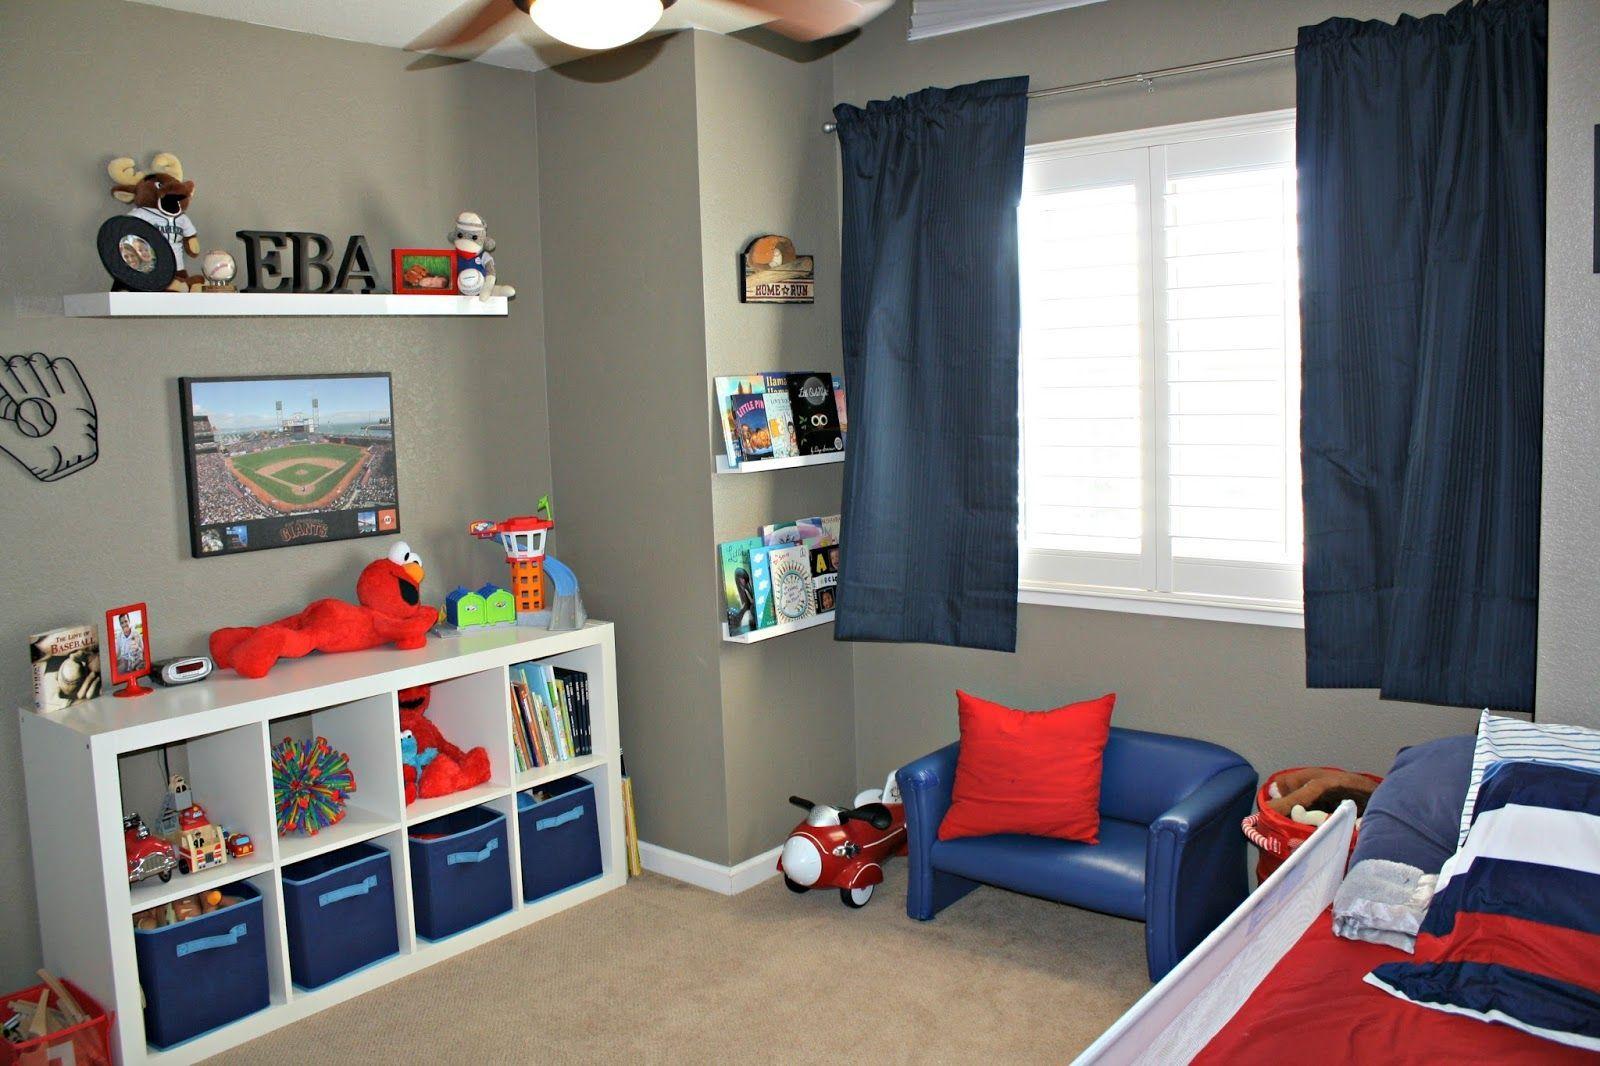 Decorating Ideas Modern Toddler Bedroom In 2020 Modern Toddler Bedroom Kids Bedroom Designs Boy Toddler Bedroom